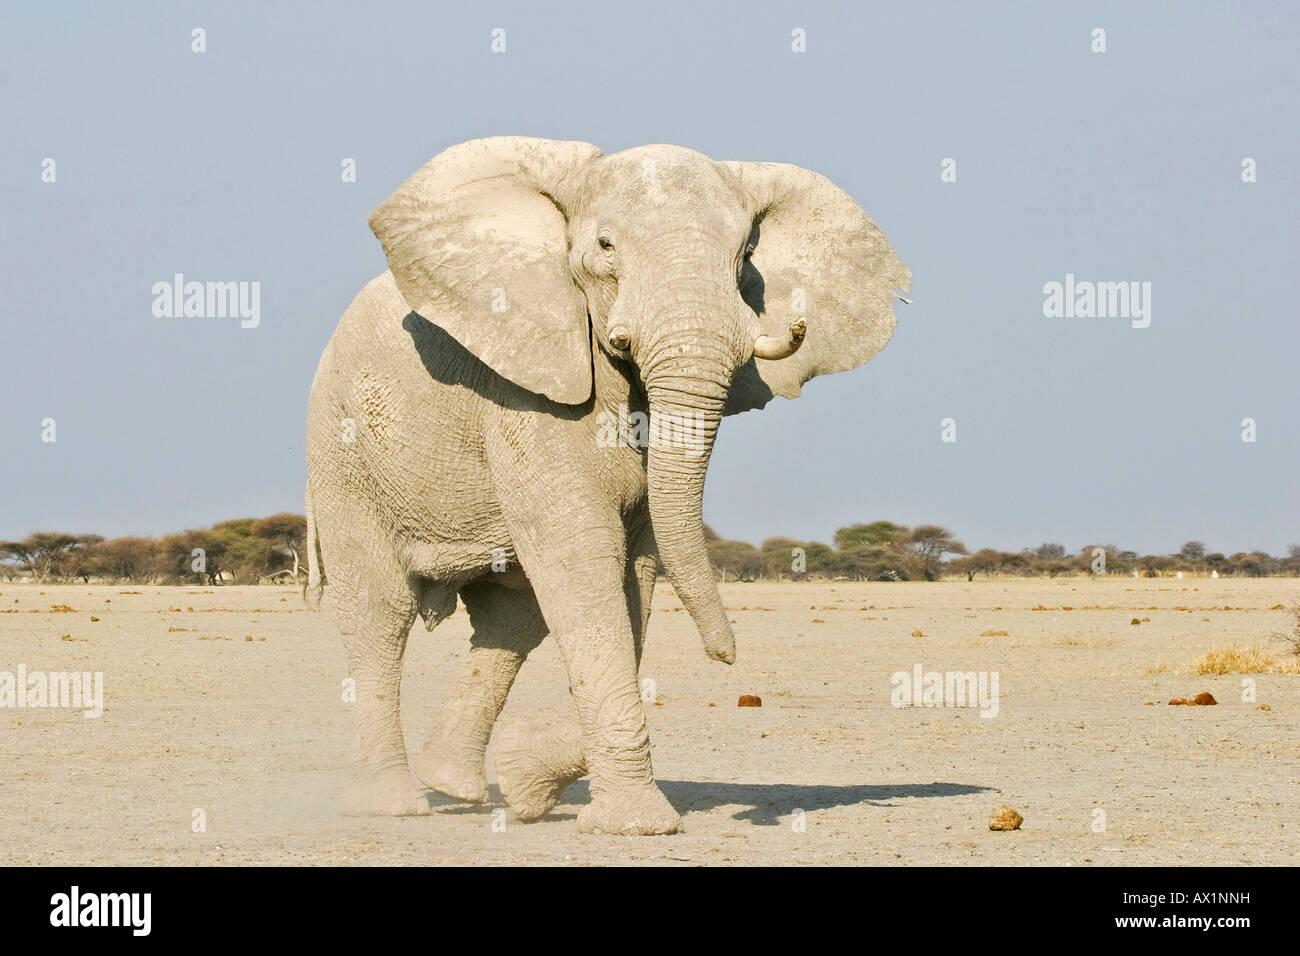 African Elephant (Loxodonta africana) attack, Nxai Pan, Makgadikgadi Pans National Park, Botswana, Africa Stock Photo